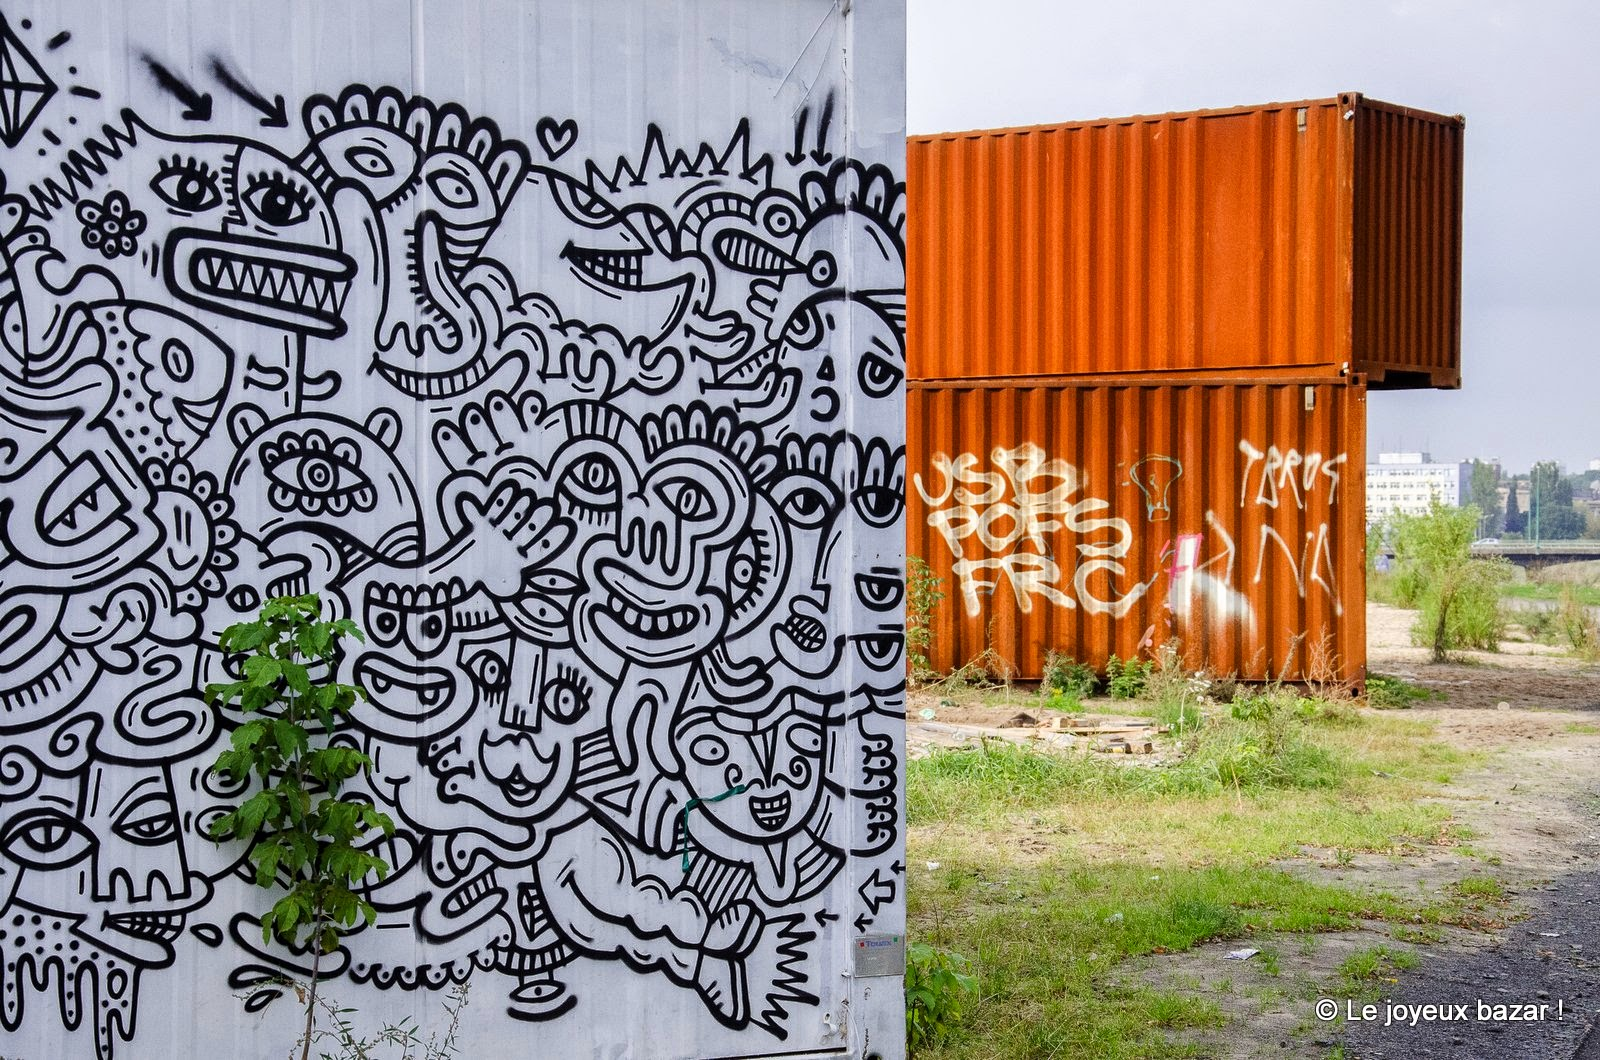 Poznan - street art